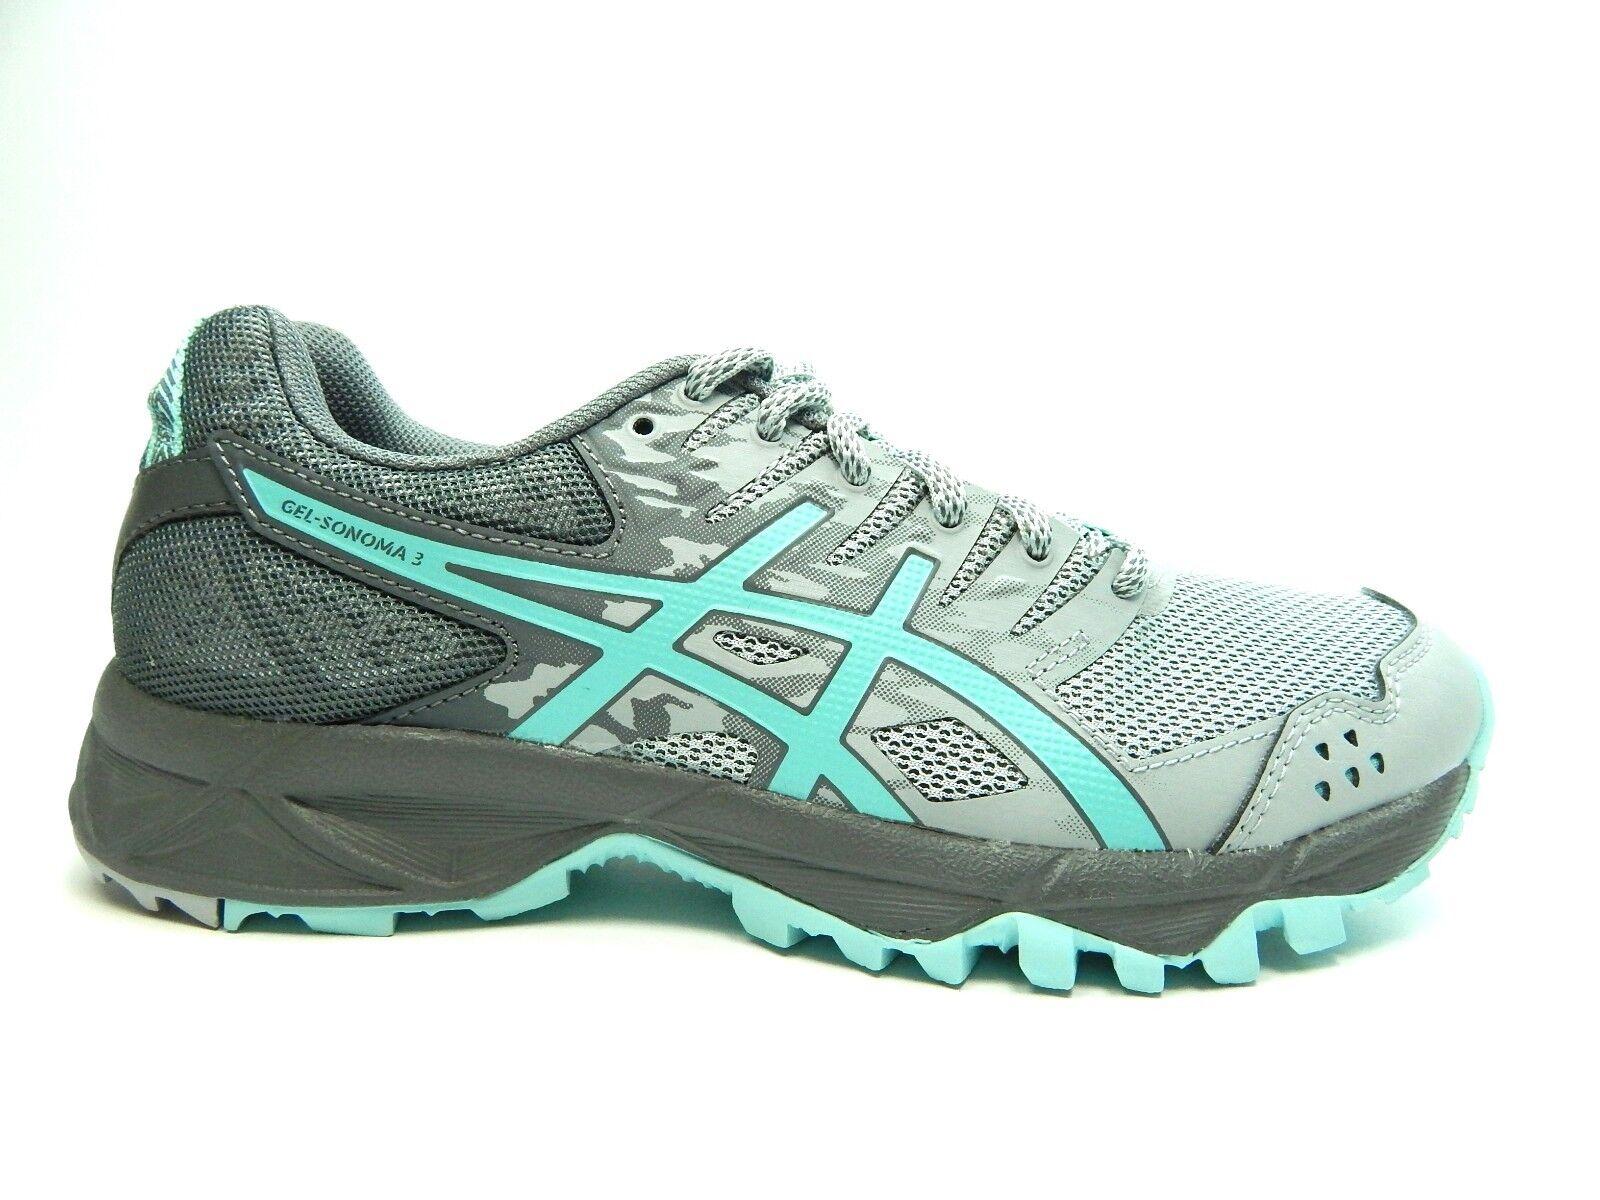 ASICS GEL SONOMA 3 T774N 9667 MIDGREY AQUA Running Women Shoes SIZE 6.0-7.0 Comfortable and good-looking